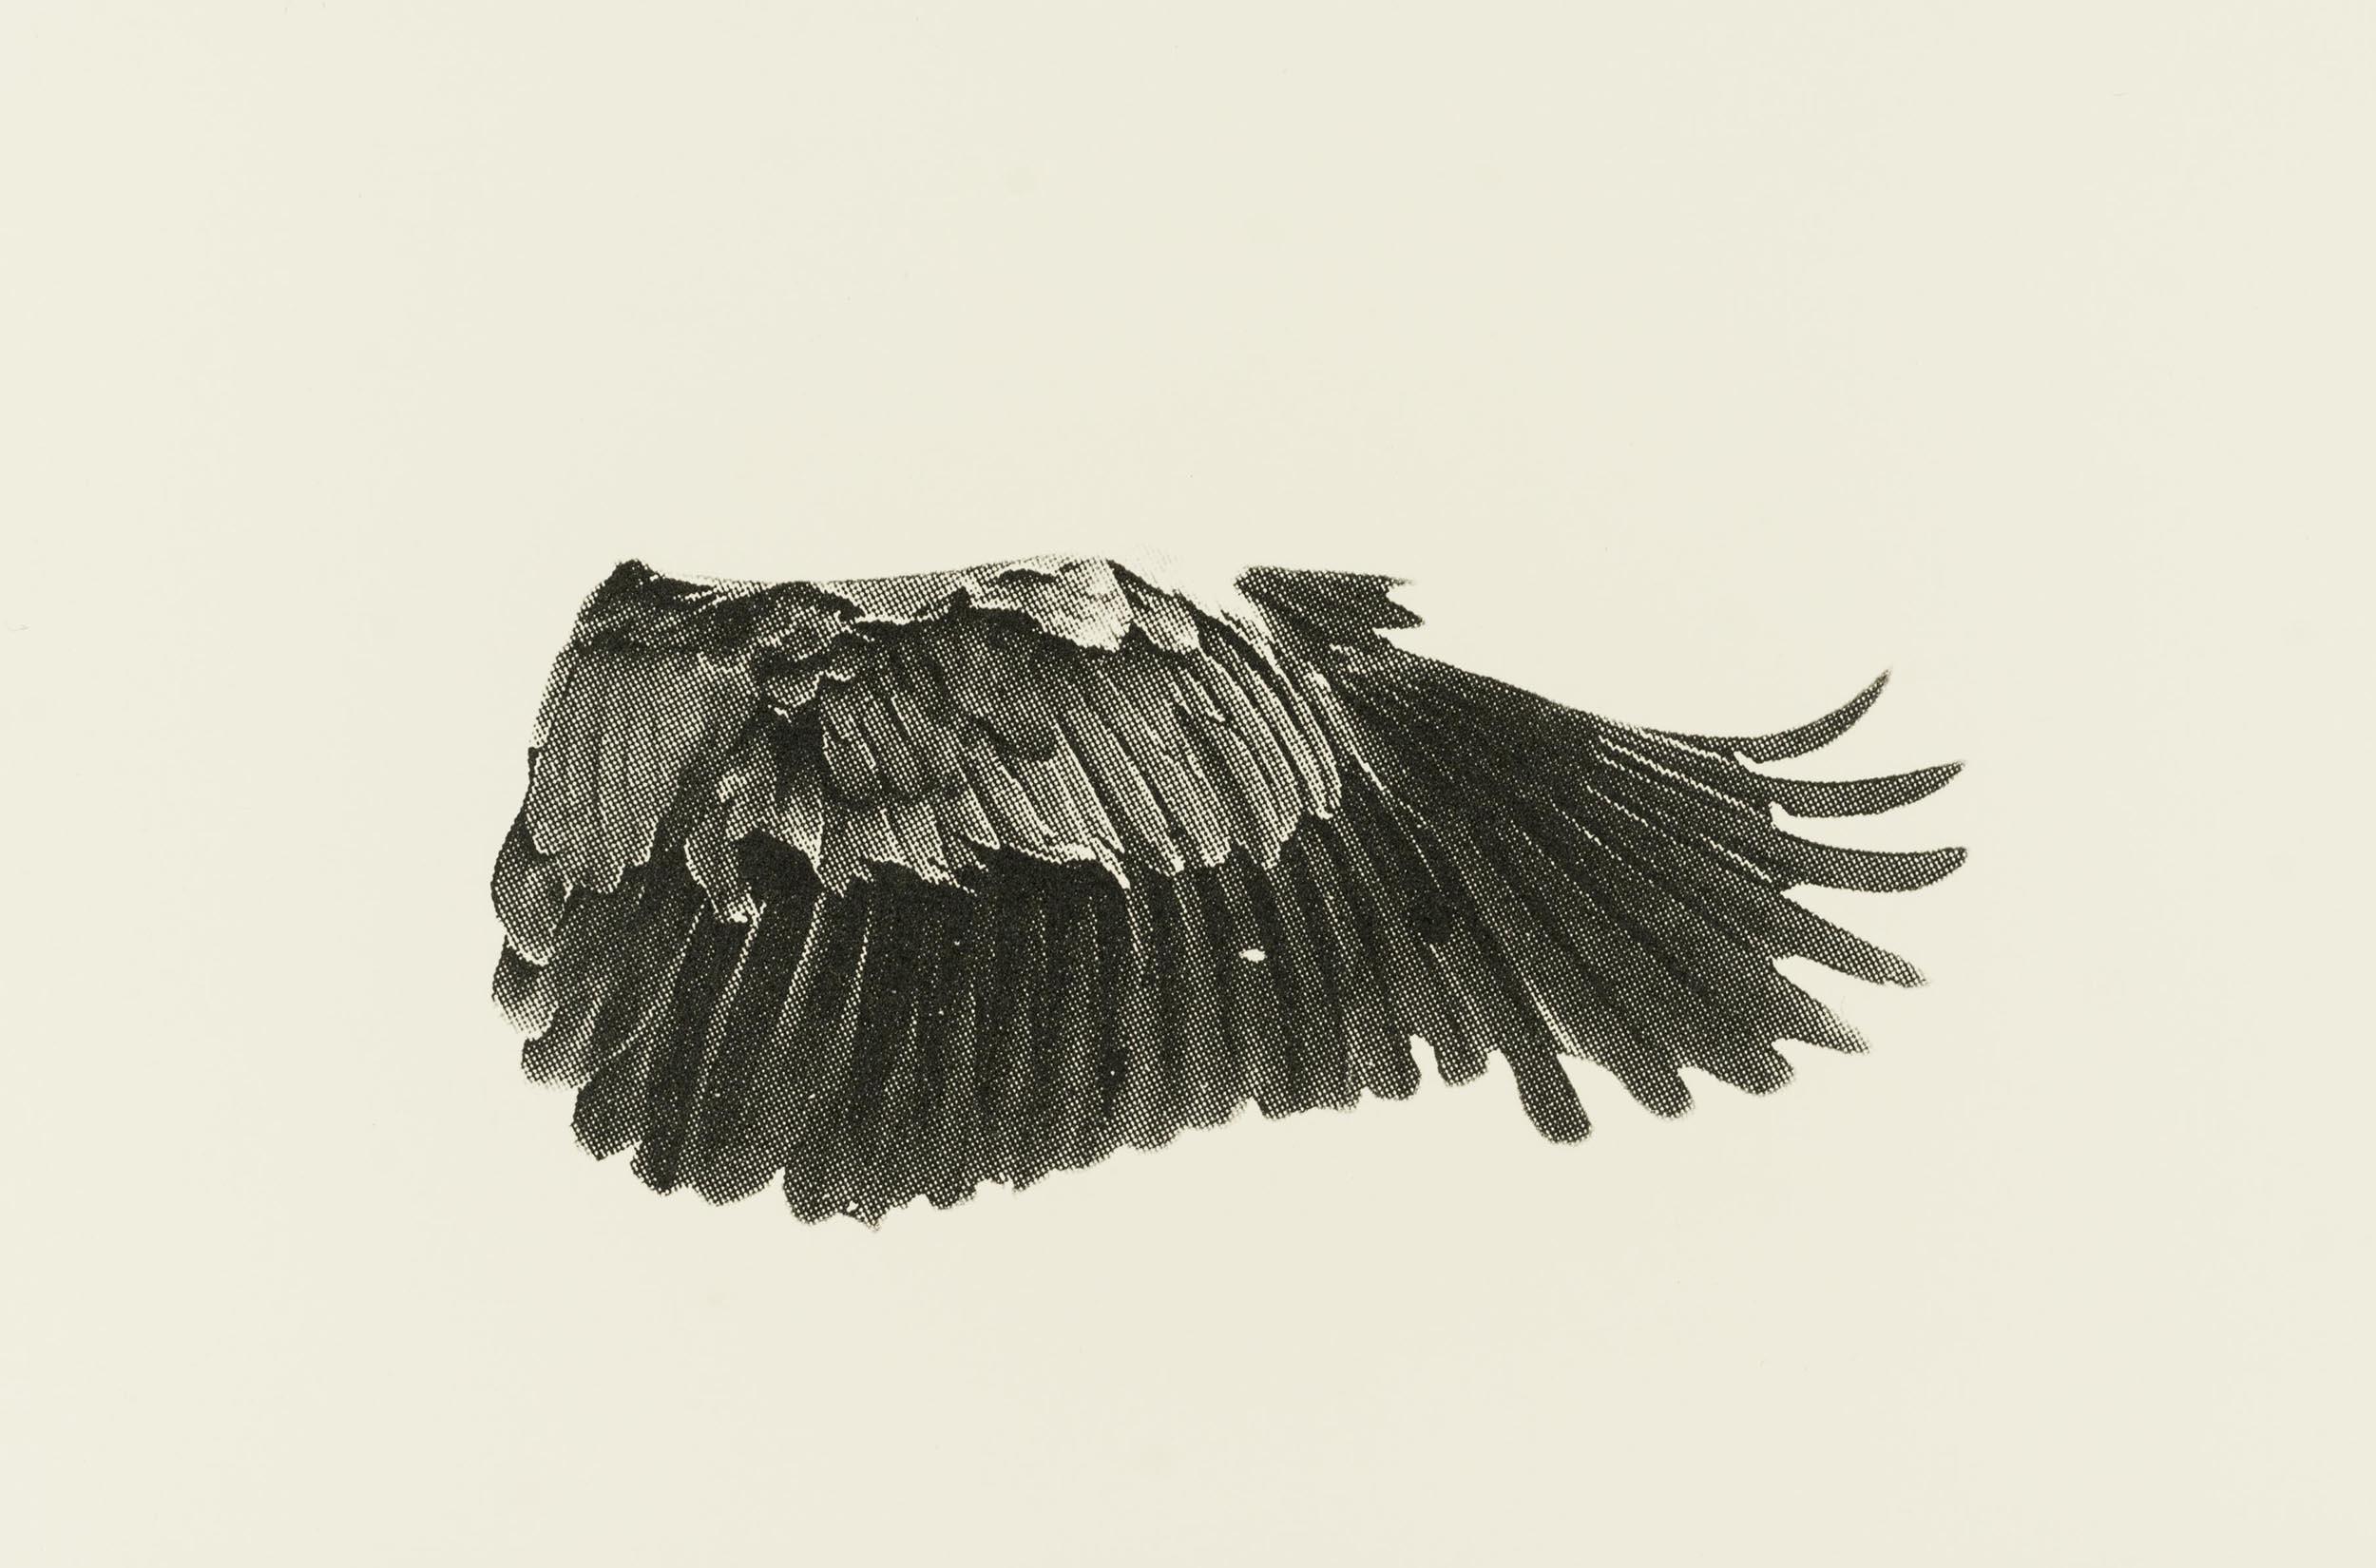 Eve-Biddle-Artworks-Dutchess-Heron-Wing-2016-01